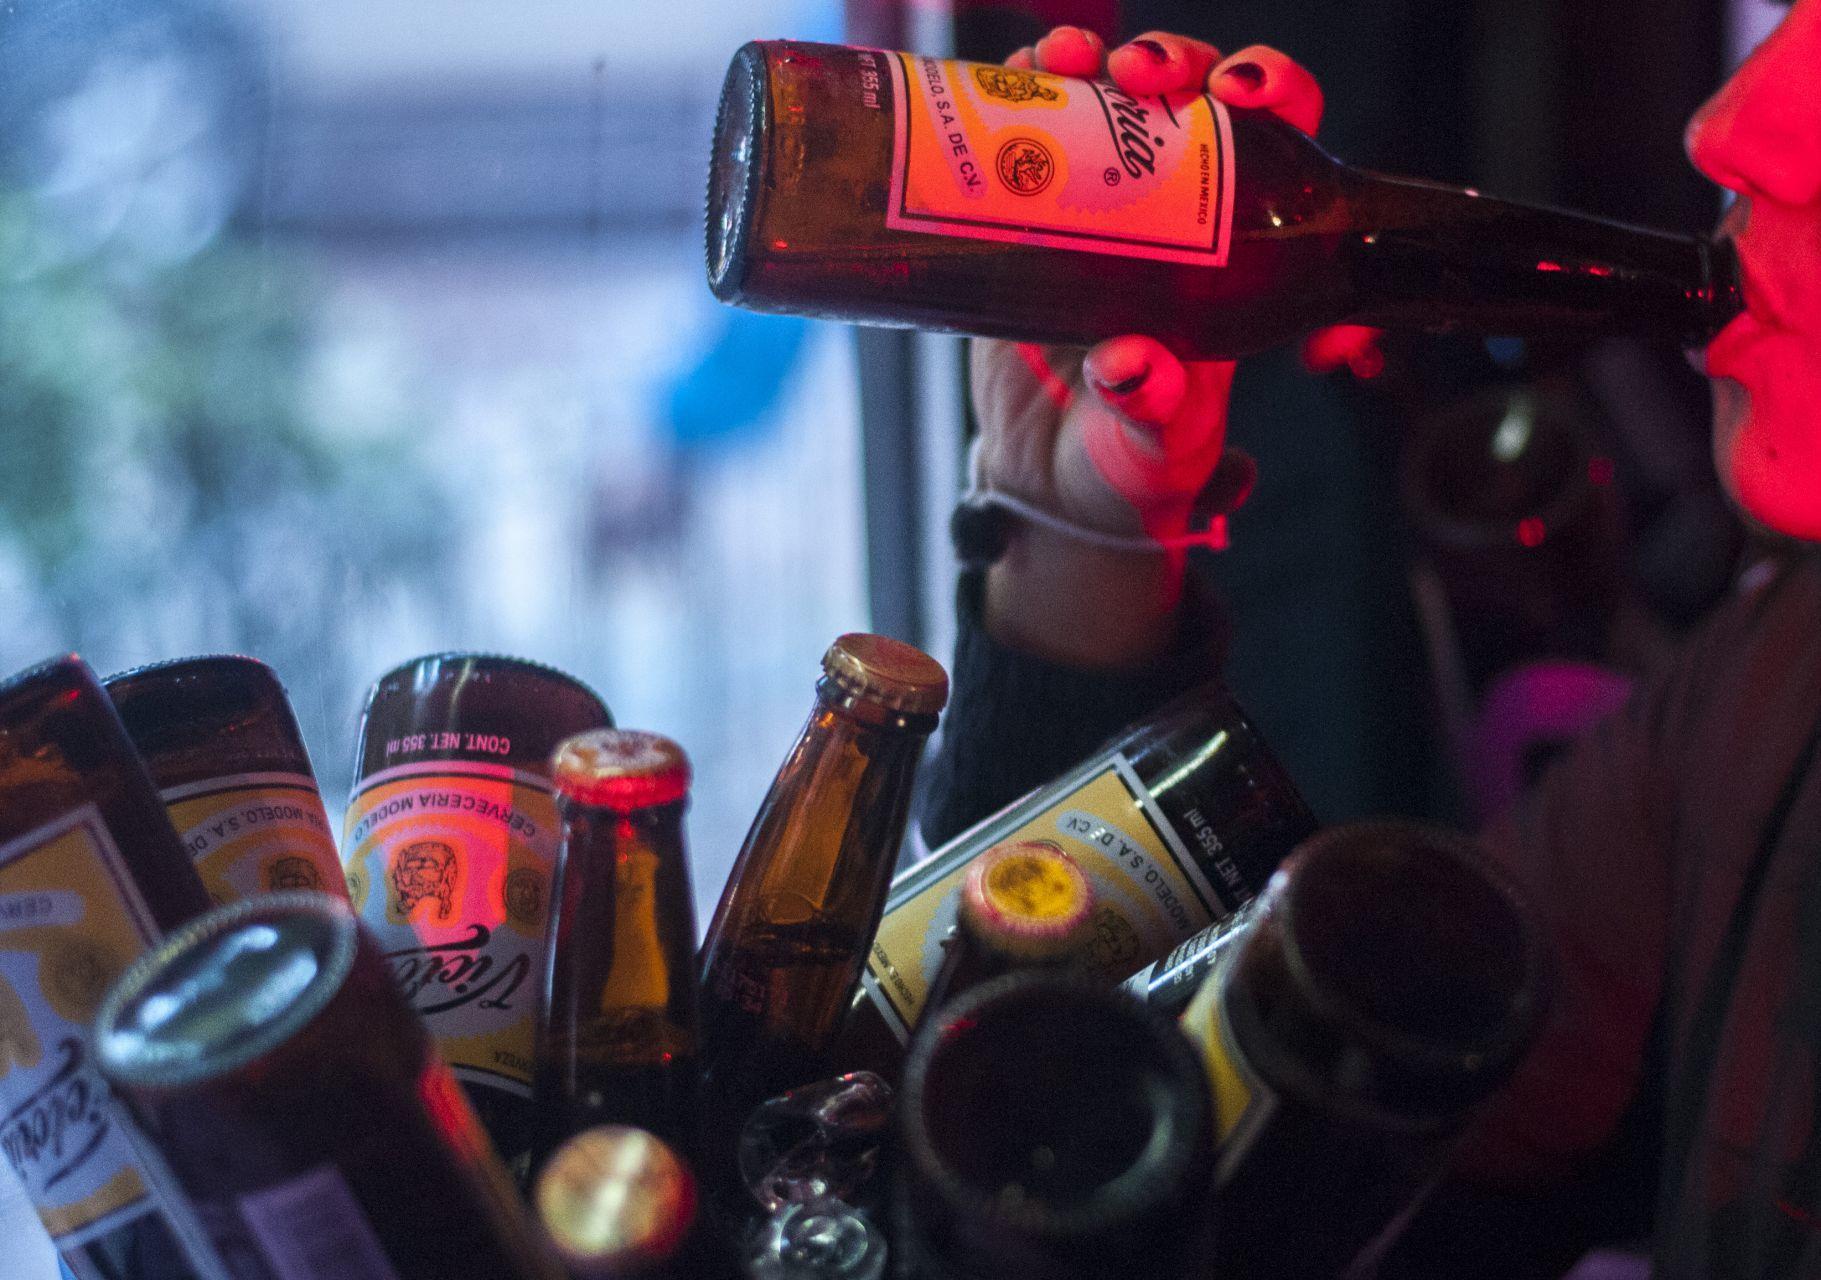 jovenes-alcohol-bares-cdmx-mexico-04102020